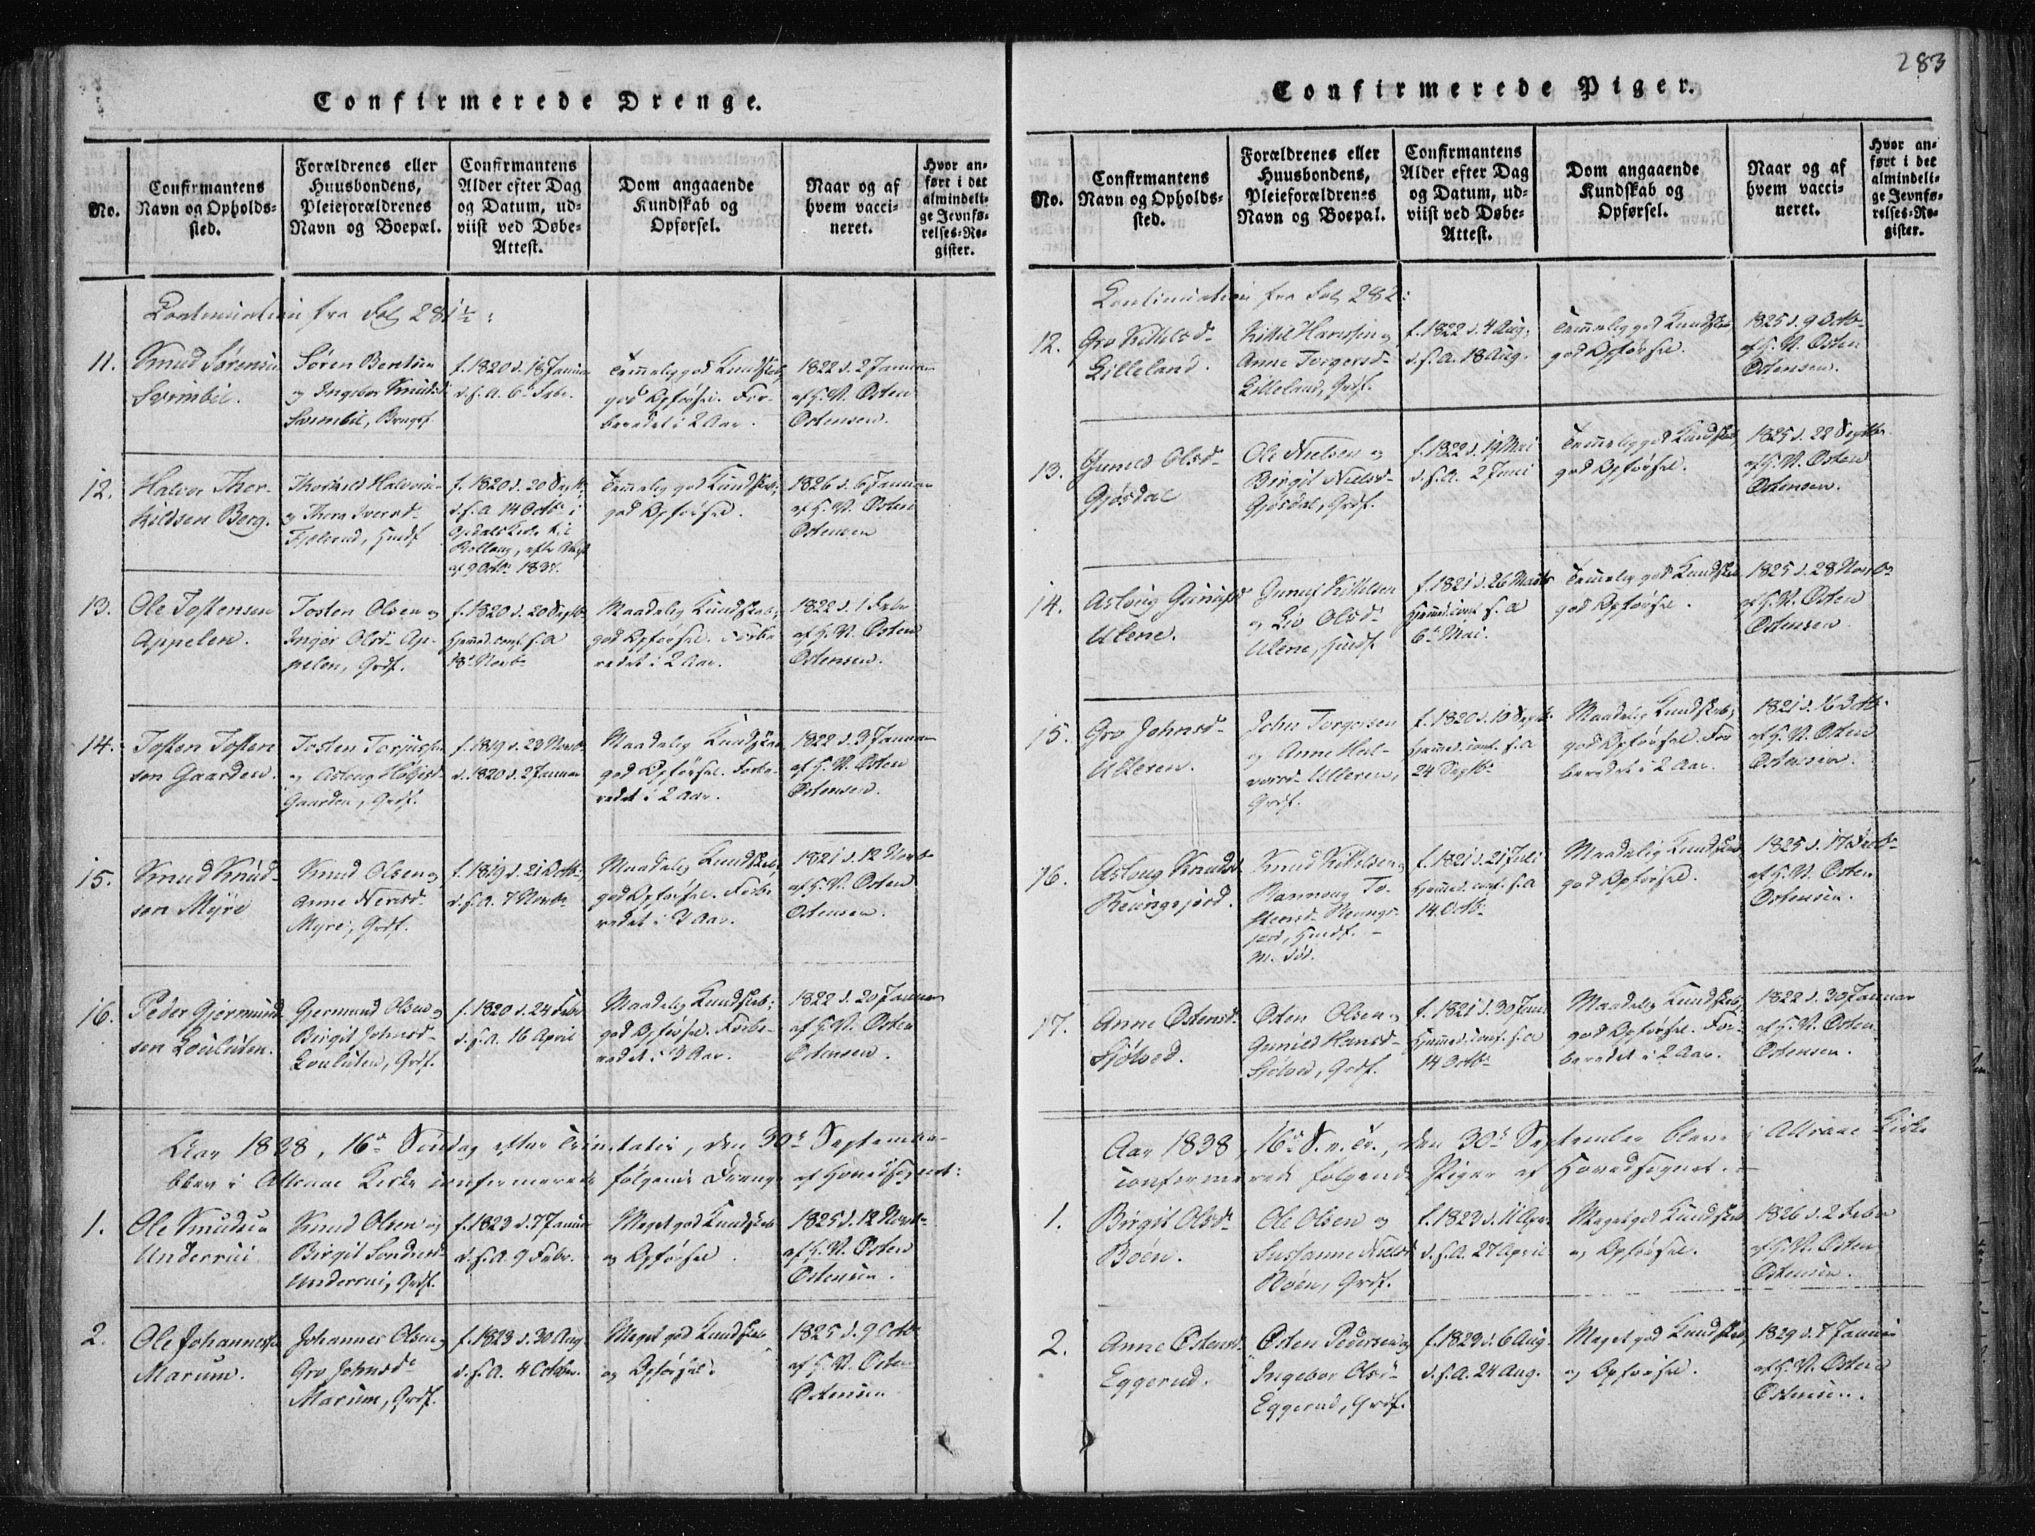 SAKO, Tinn kirkebøker, F/Fa/L0004: Ministerialbok nr. I 4, 1815-1843, s. 283